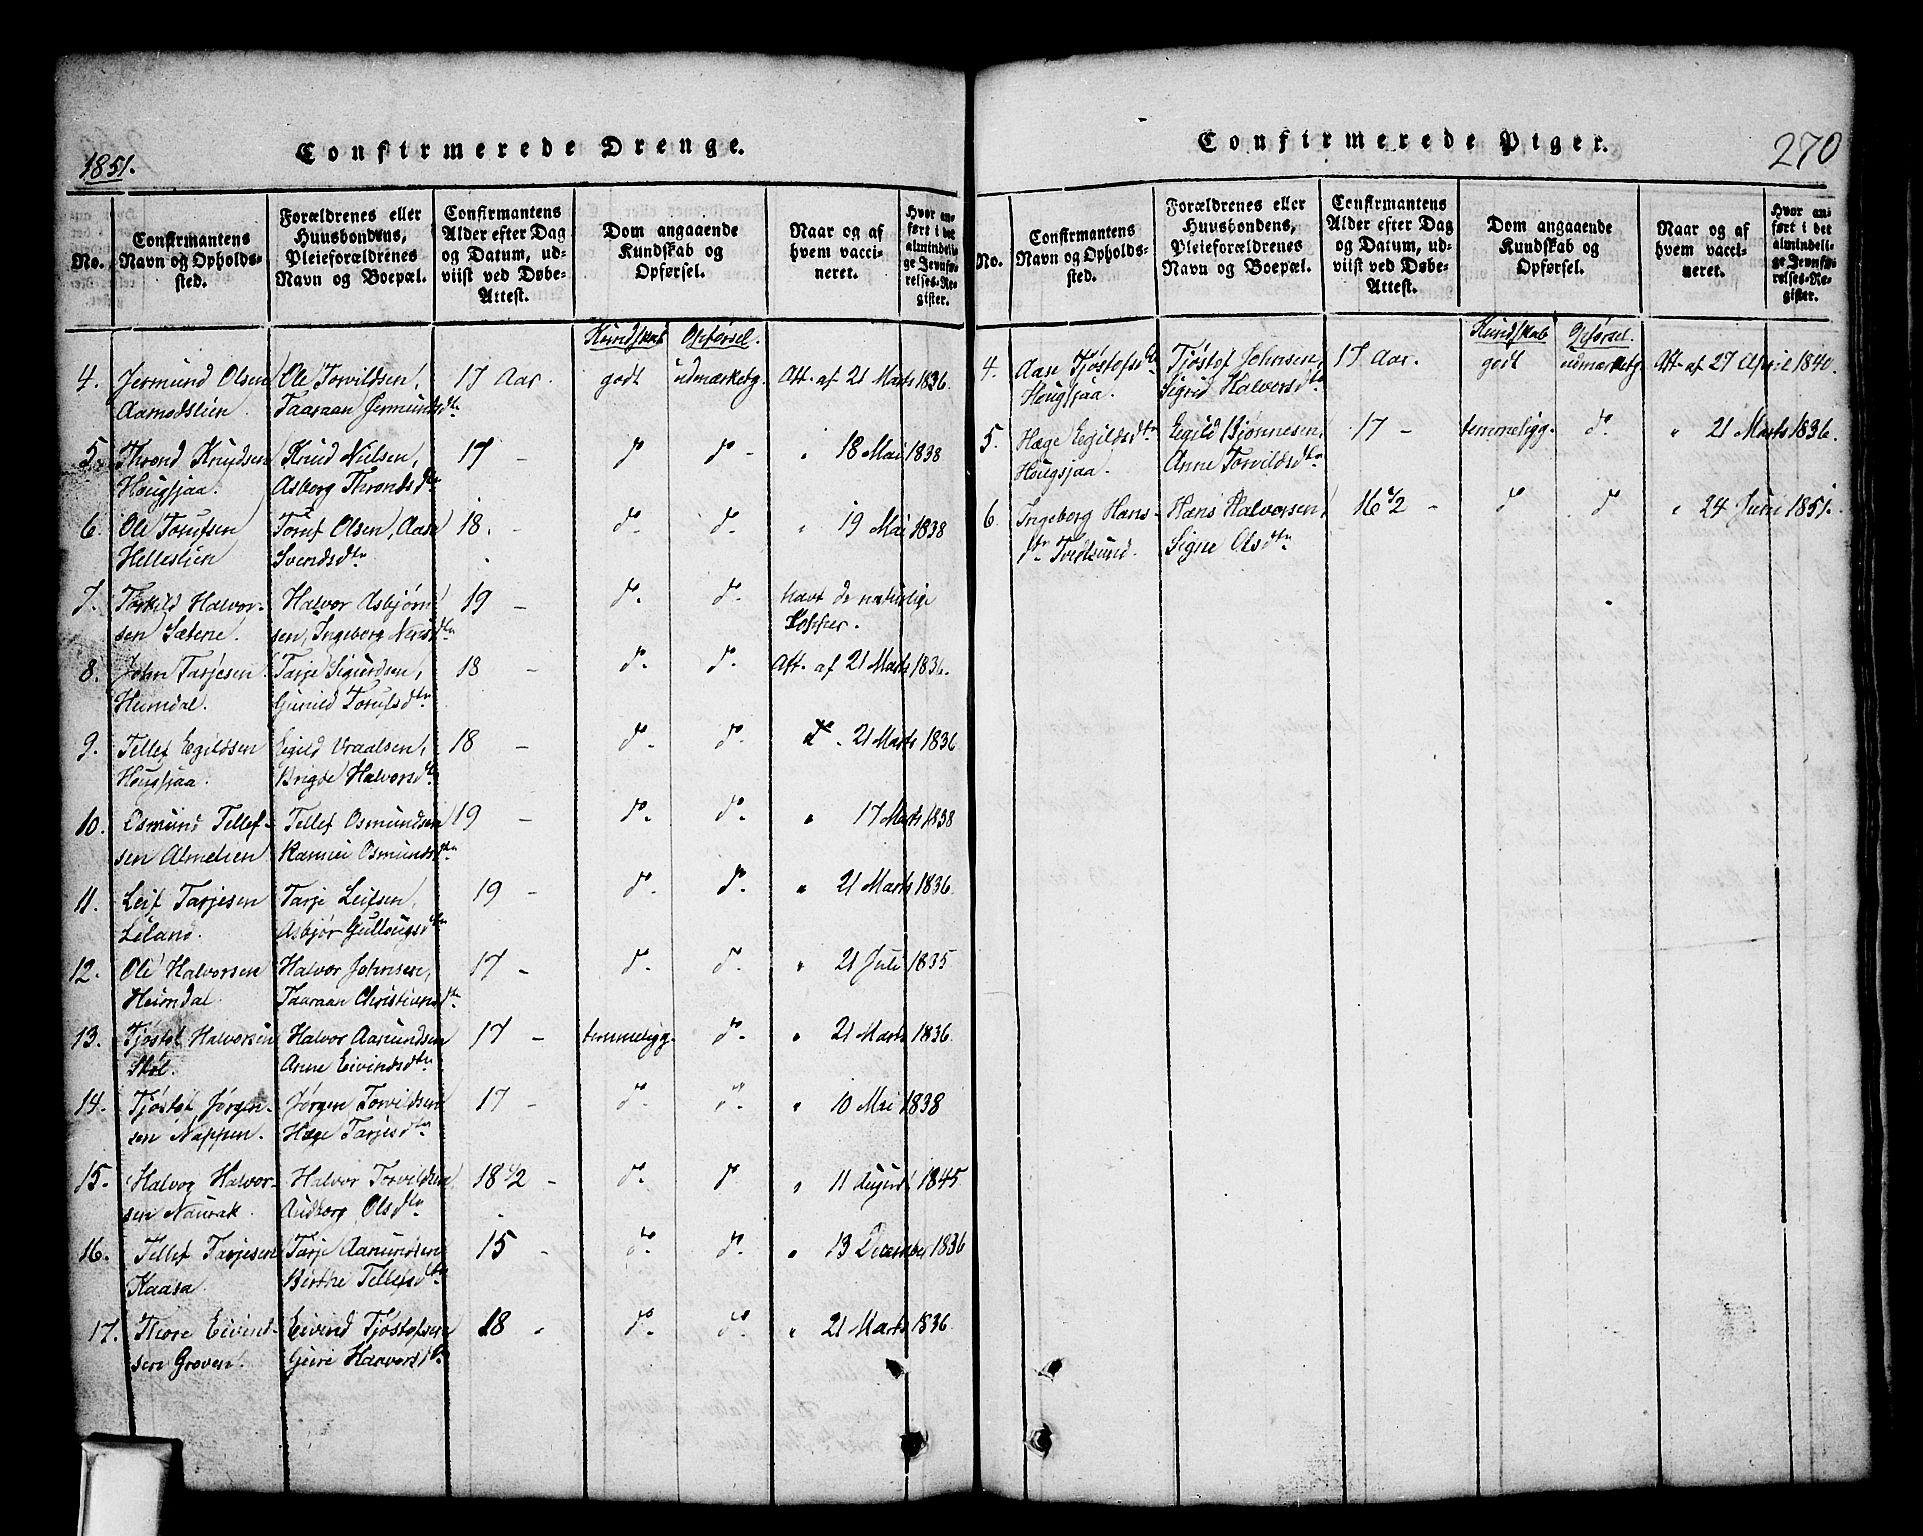 SAKO, Nissedal kirkebøker, G/Gb/L0001: Klokkerbok nr. II 1, 1814-1862, s. 270